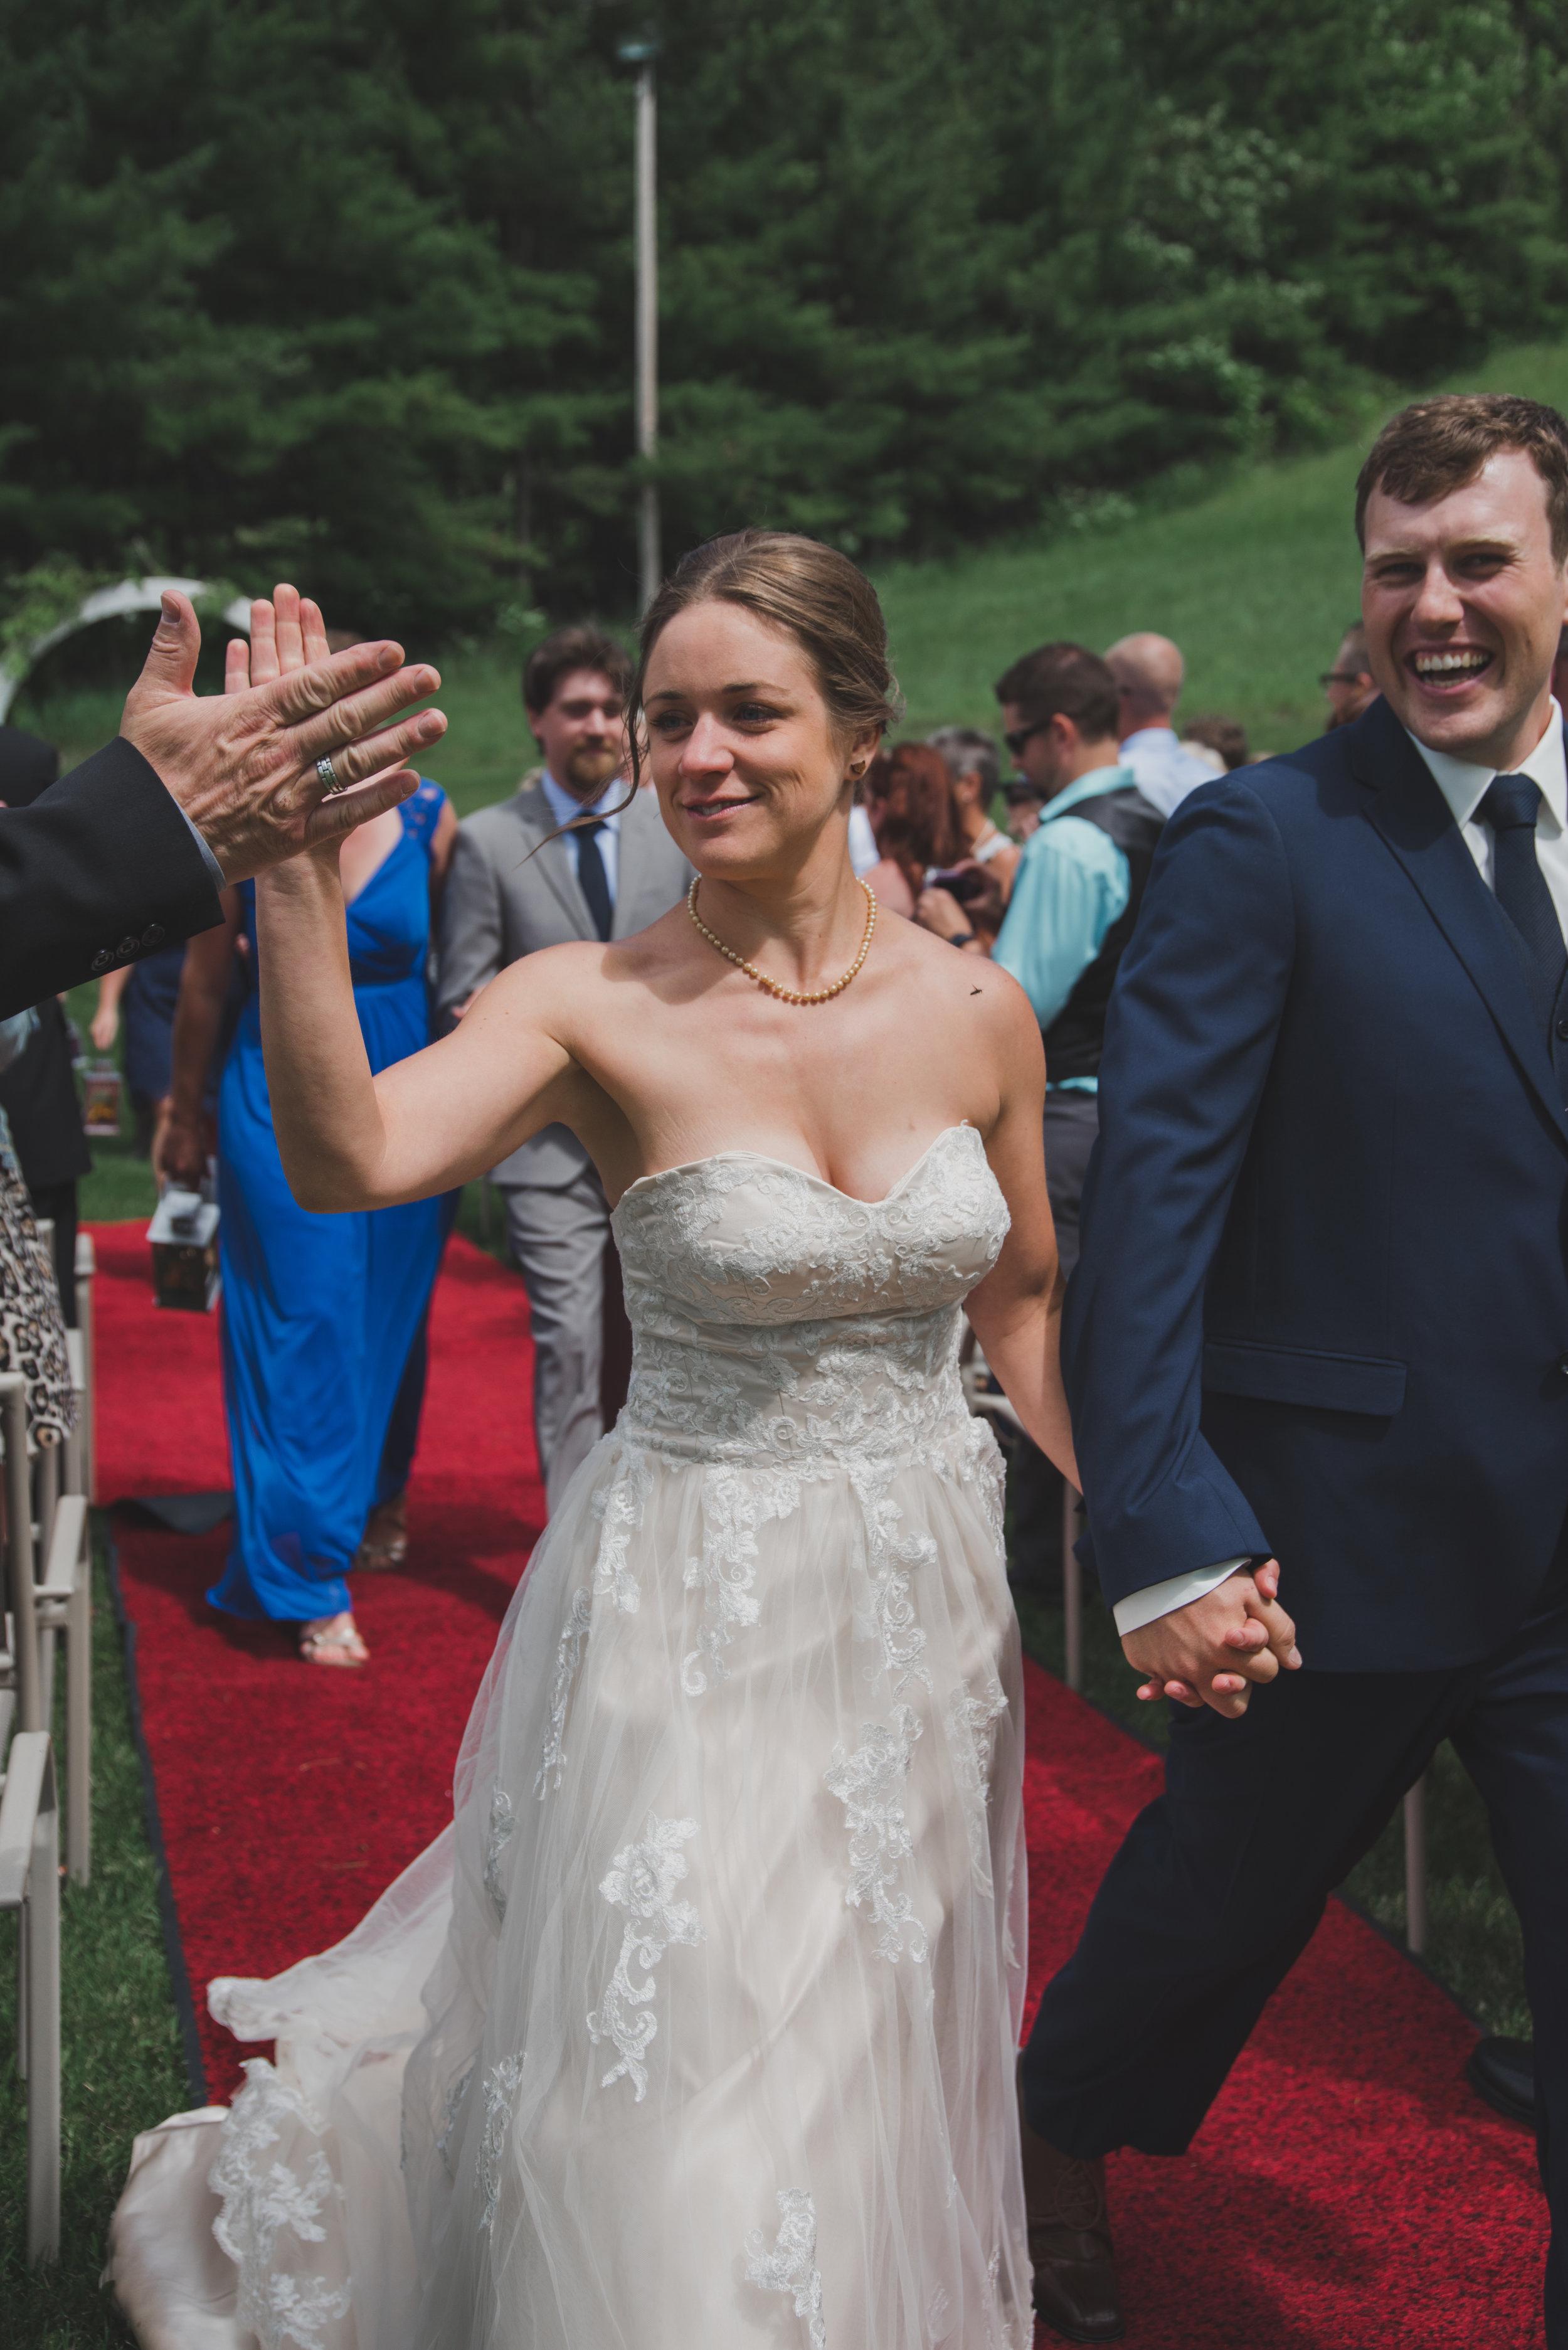 SheriCorey-Wedding-June242017-Ceremony-00089.jpg